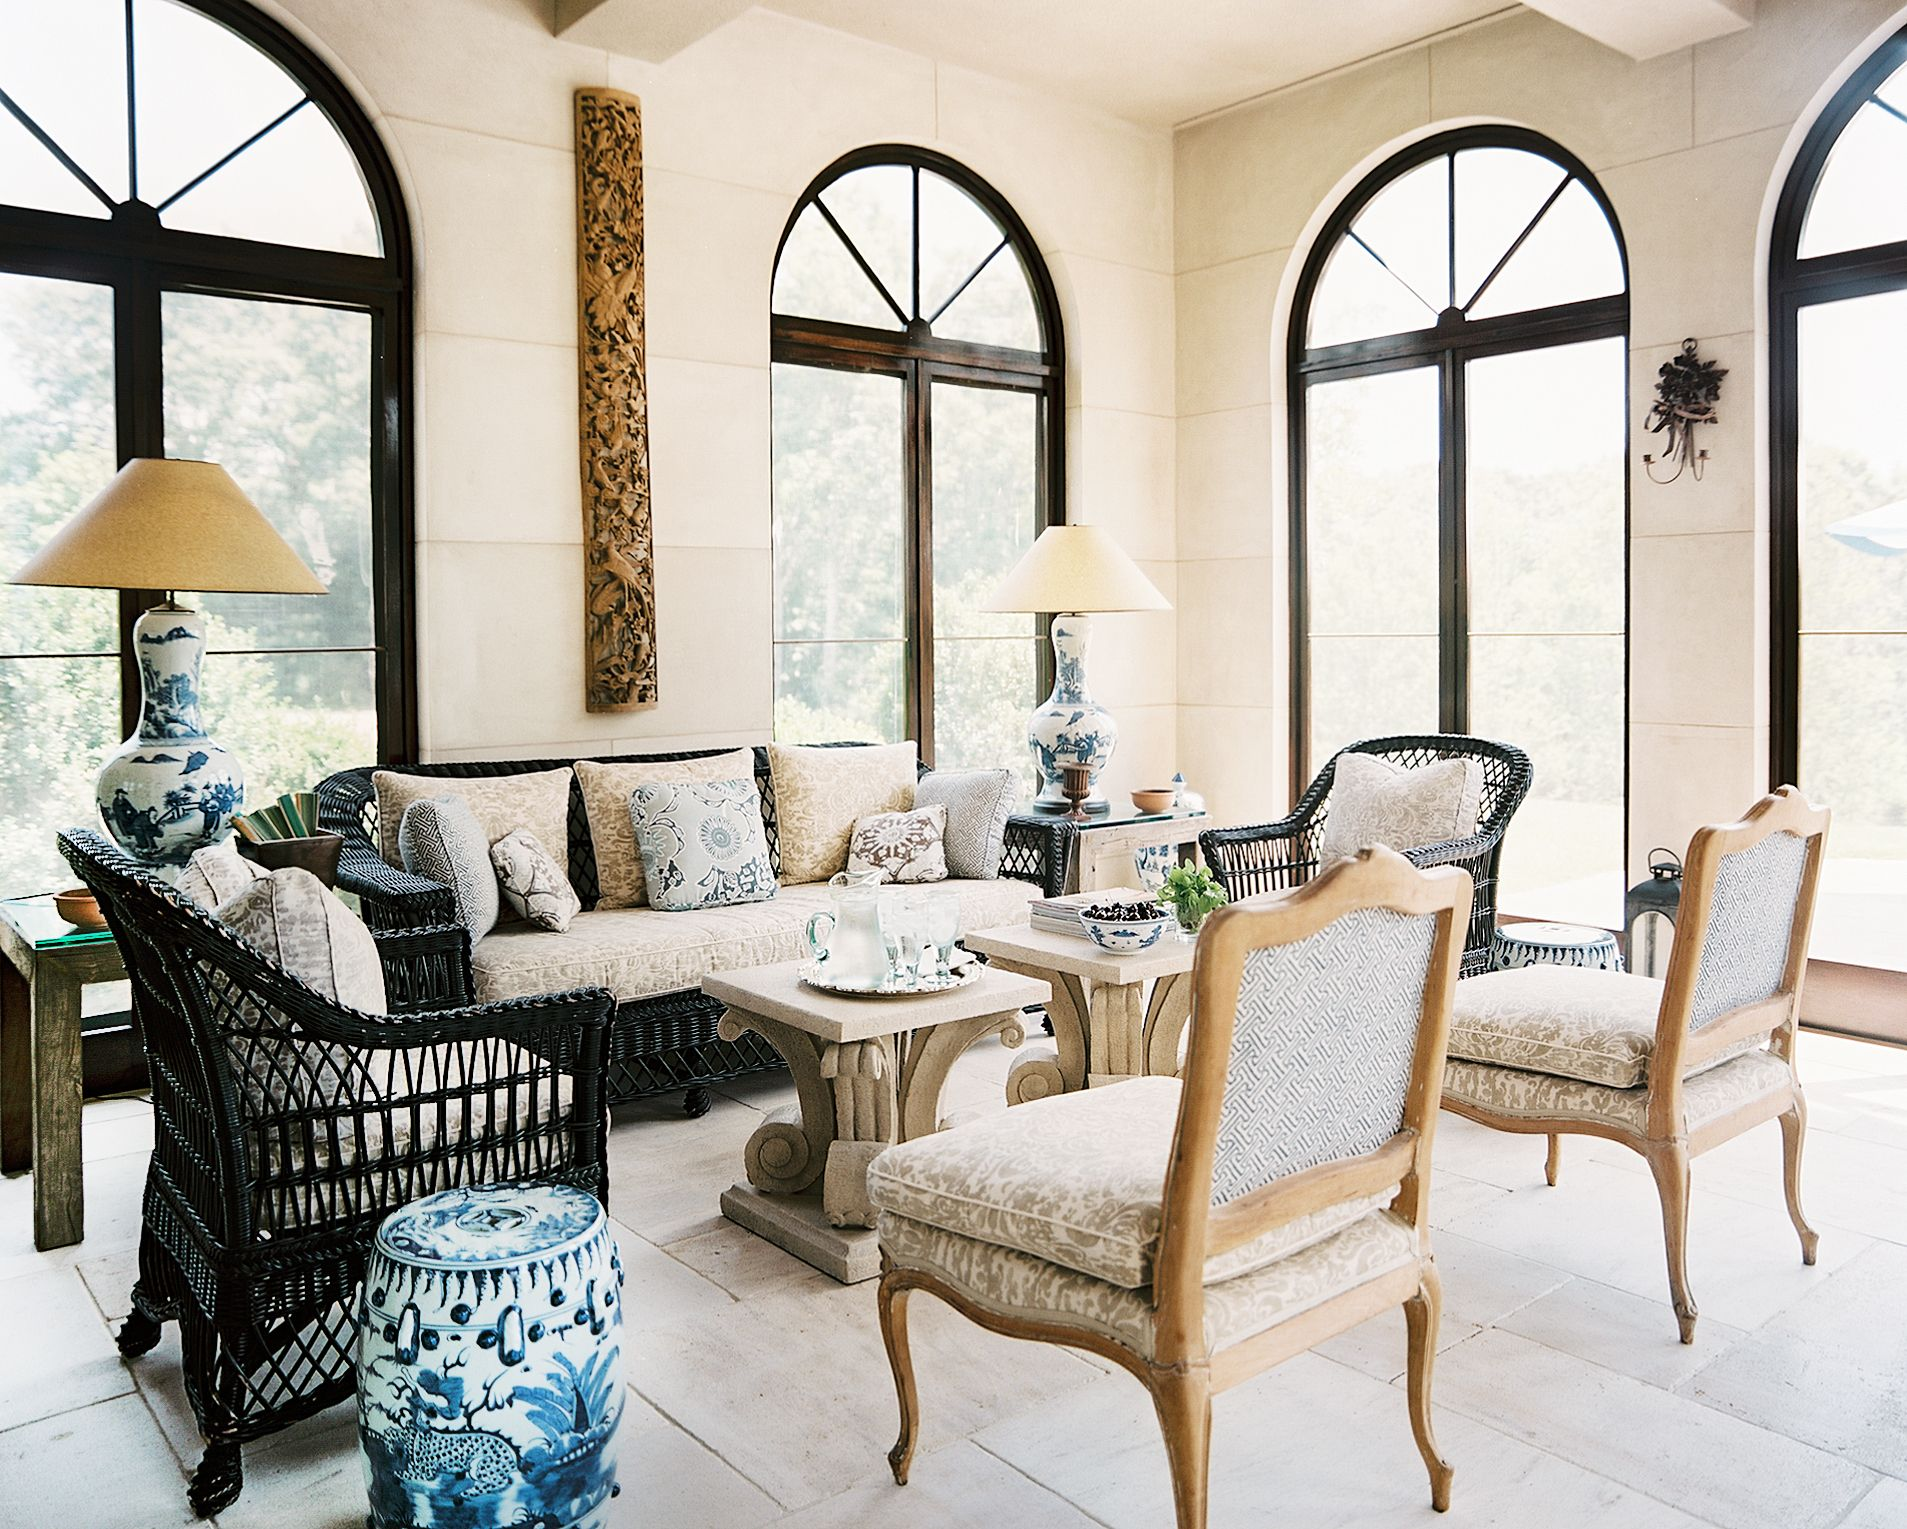 Home Tour Inside a Classical Hamptons Mansion